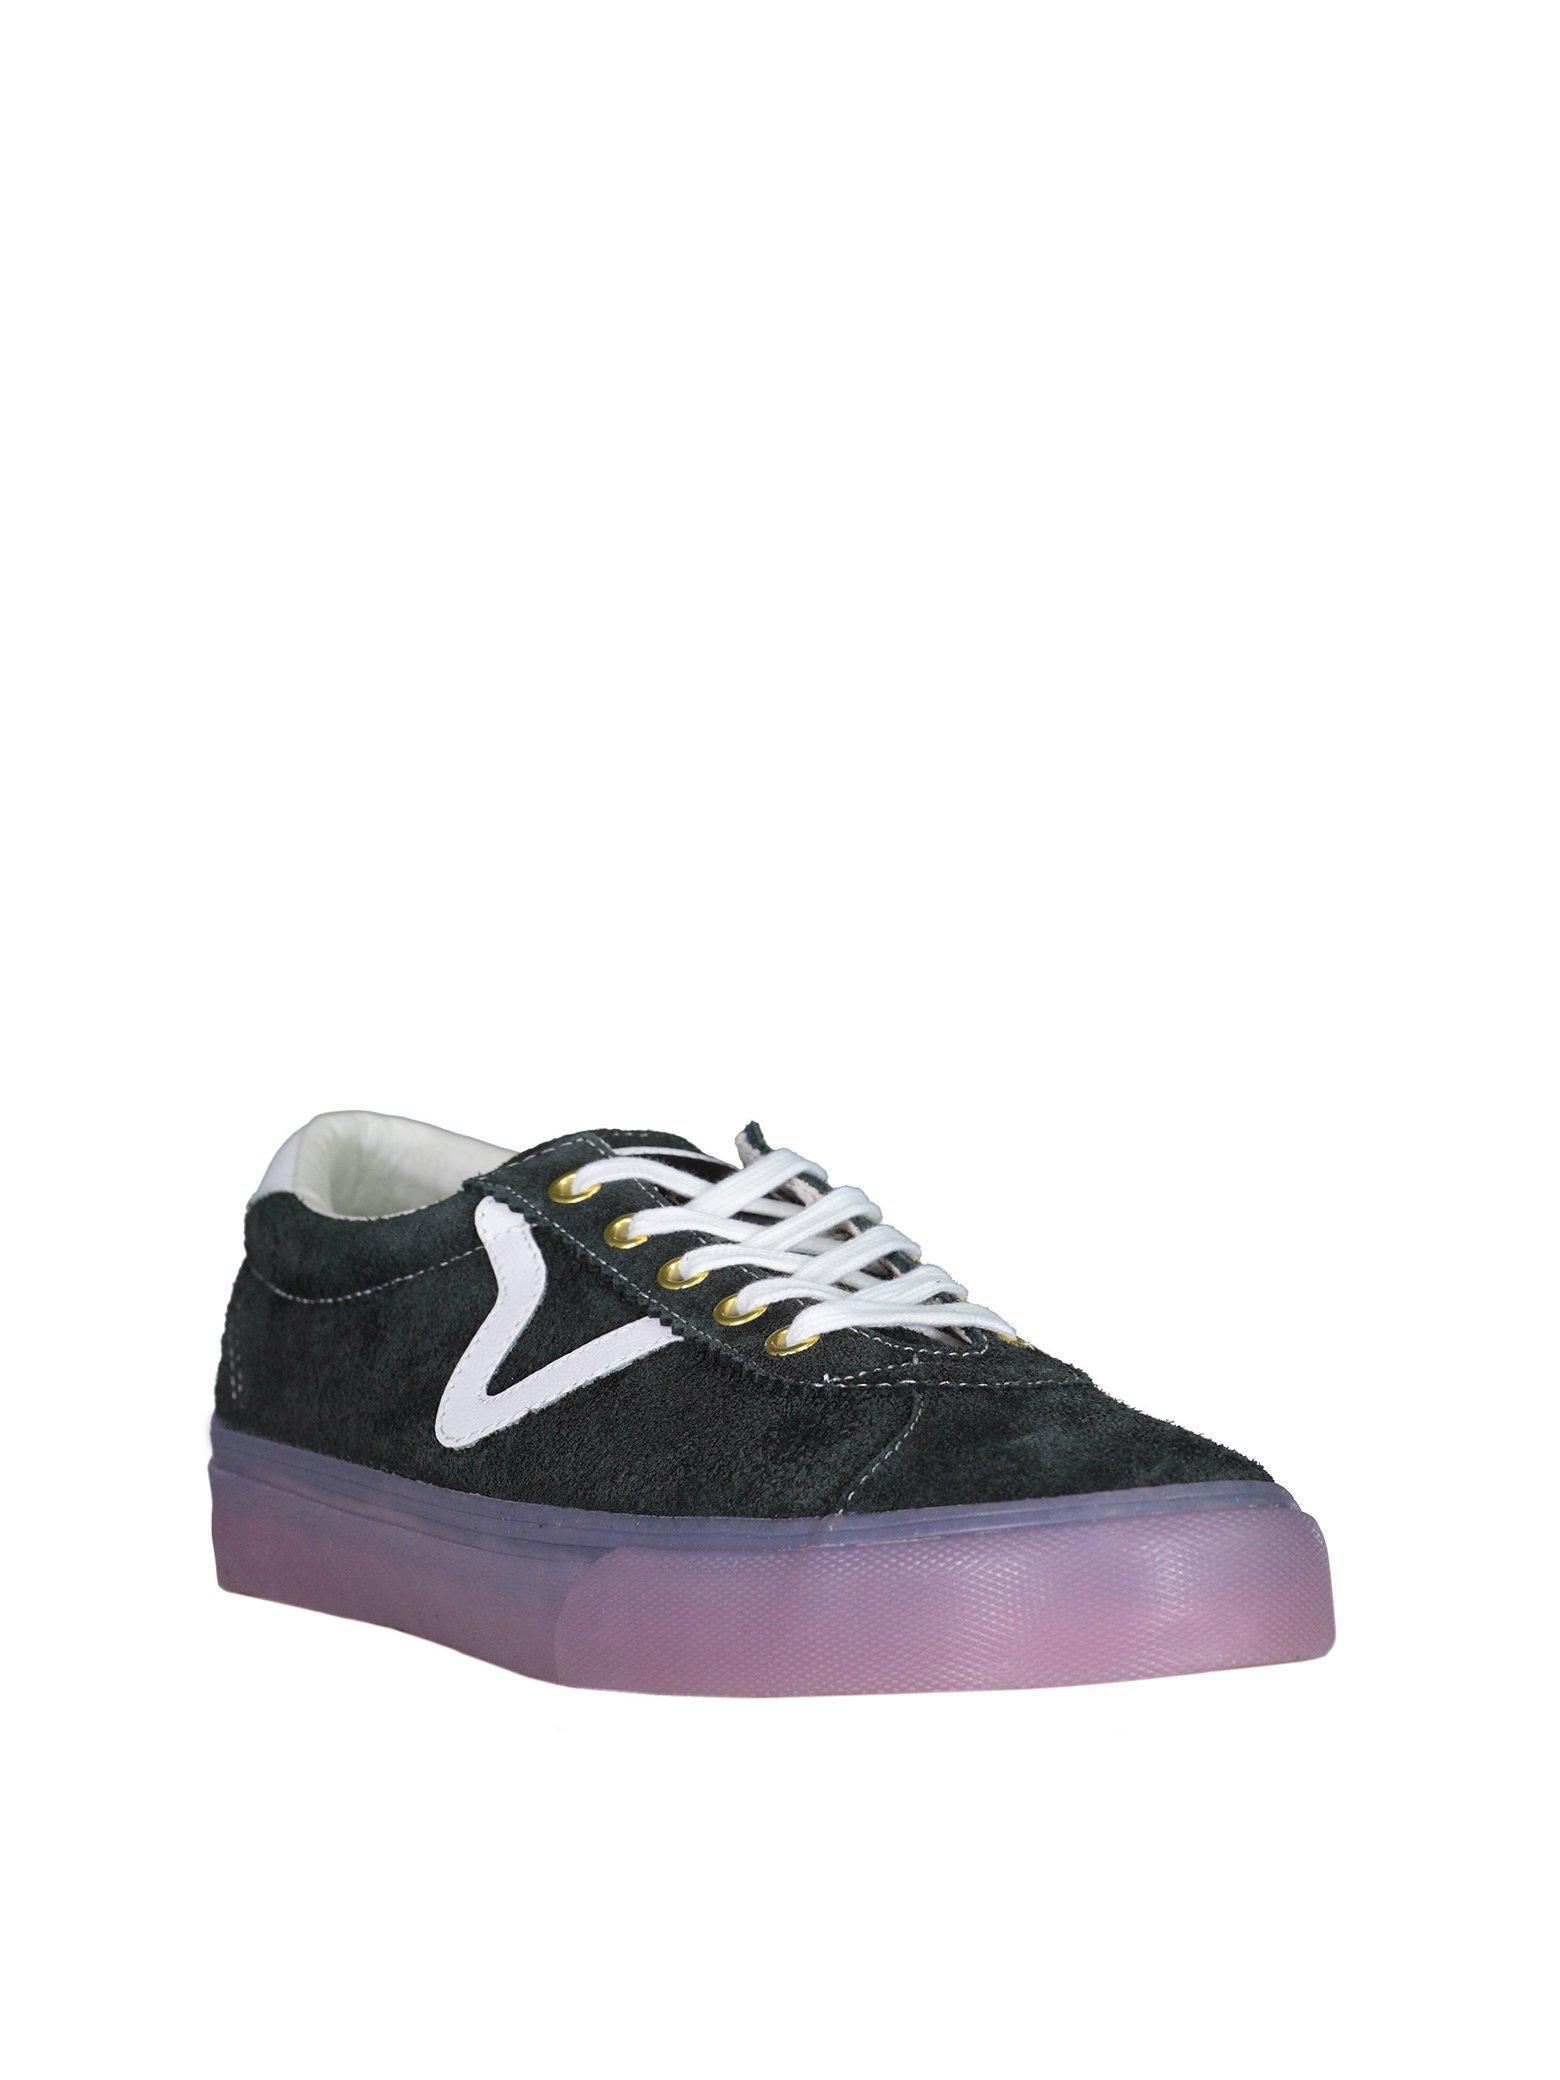 Lyst - Vans Vans X Lqqk Studio Ua Epoch Sport Lx in Black for Men c6dfe8b2c